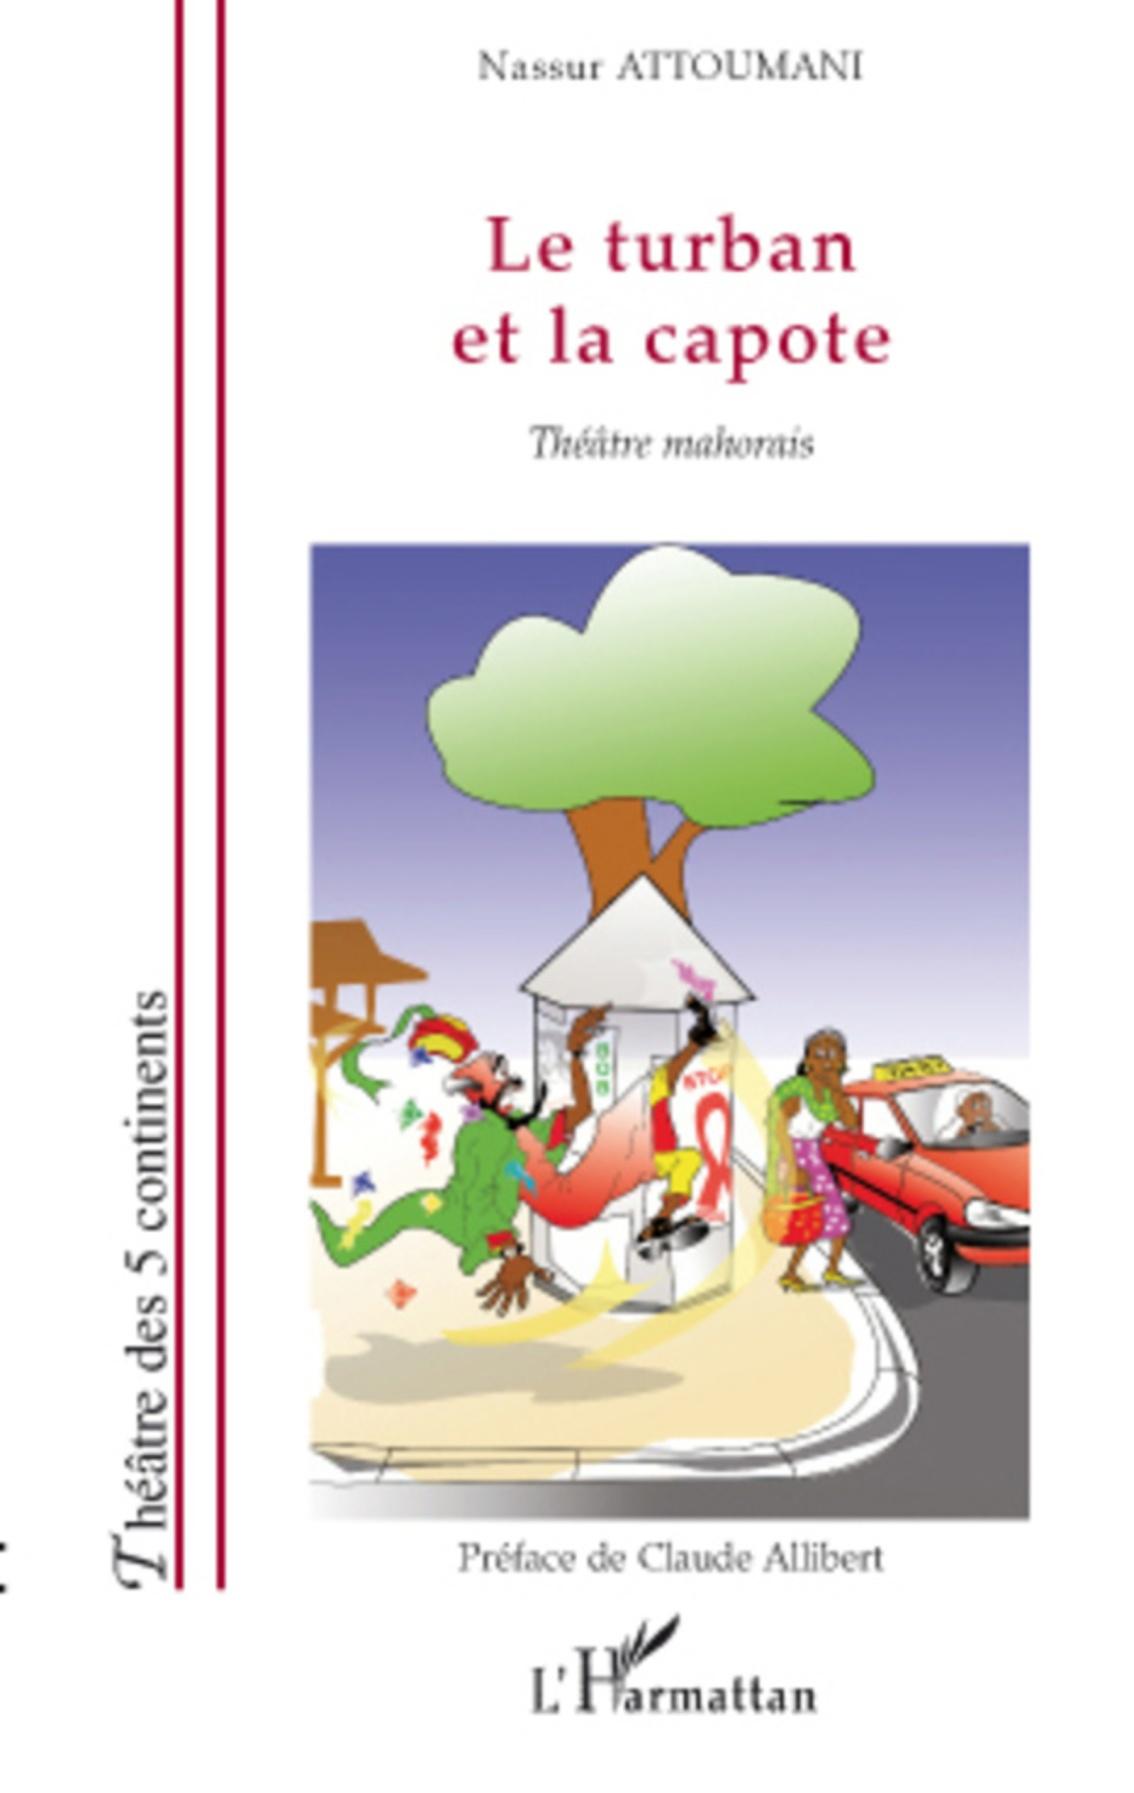 Le turban et la capote -Nassur Attoumani2009